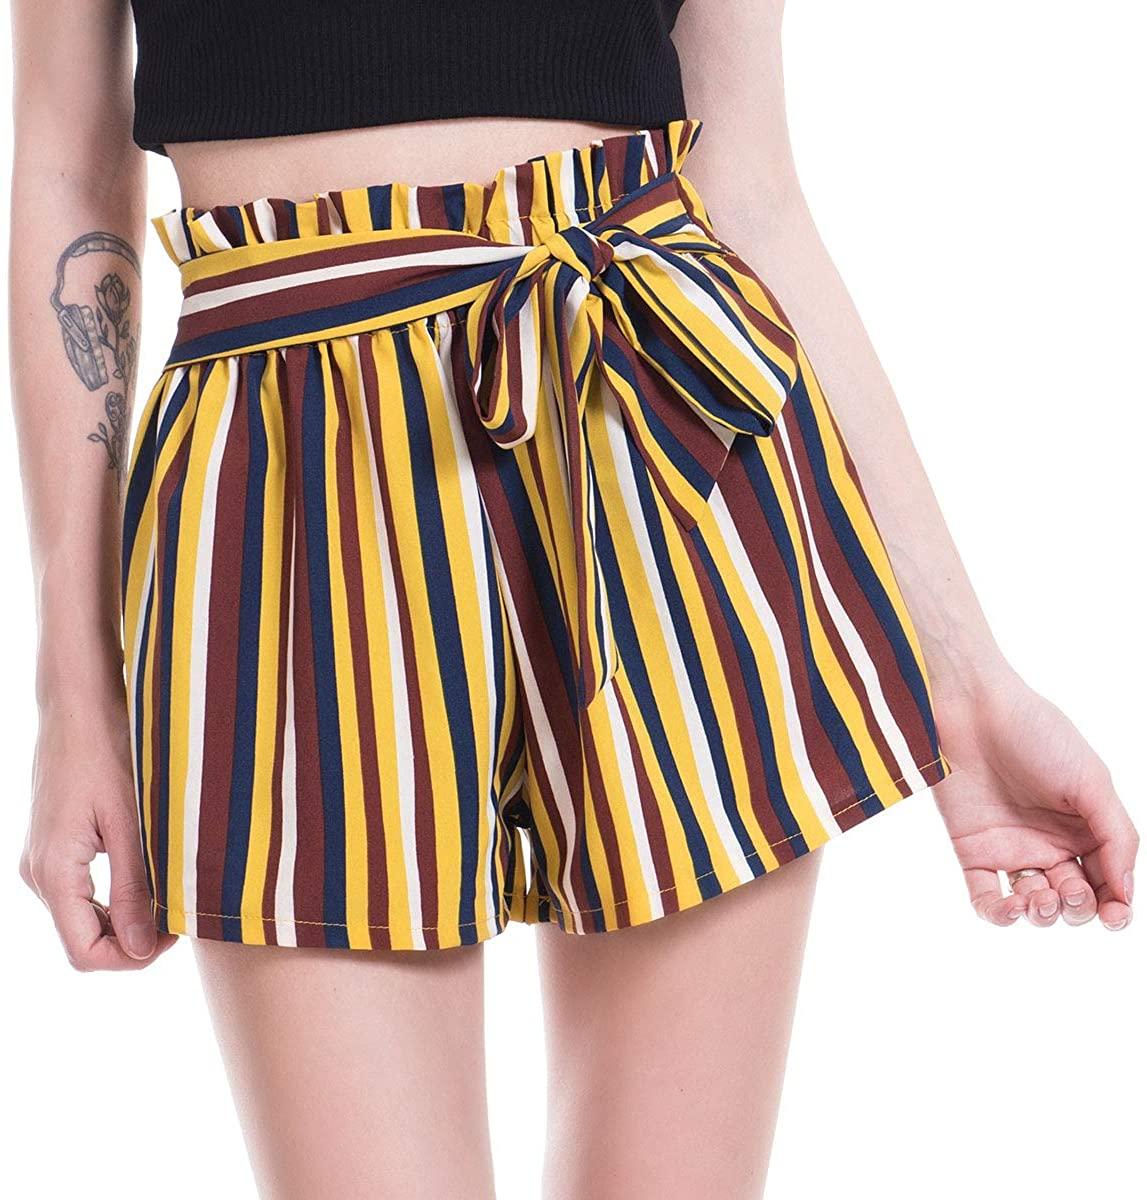 Amormio 🎀 Women's Casual Polka Dot Ruffle Bow-Tie Elastic Waist Summer Beach Jersey Walking Shorts